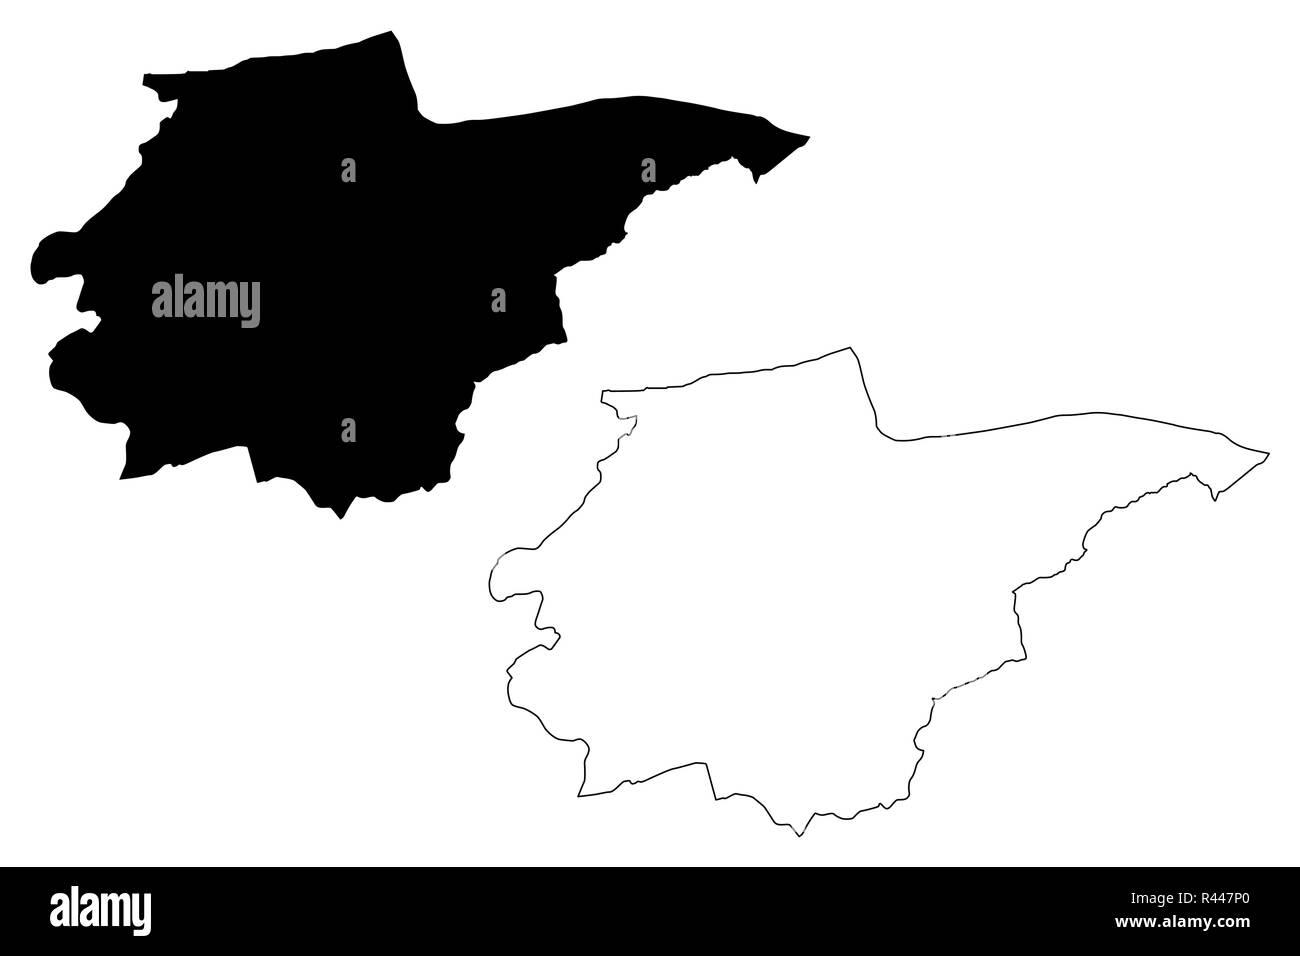 Duzce (Provinces of the Republic of Turkey) map vector illustration, scribble sketch Düzce ili map - Stock Image